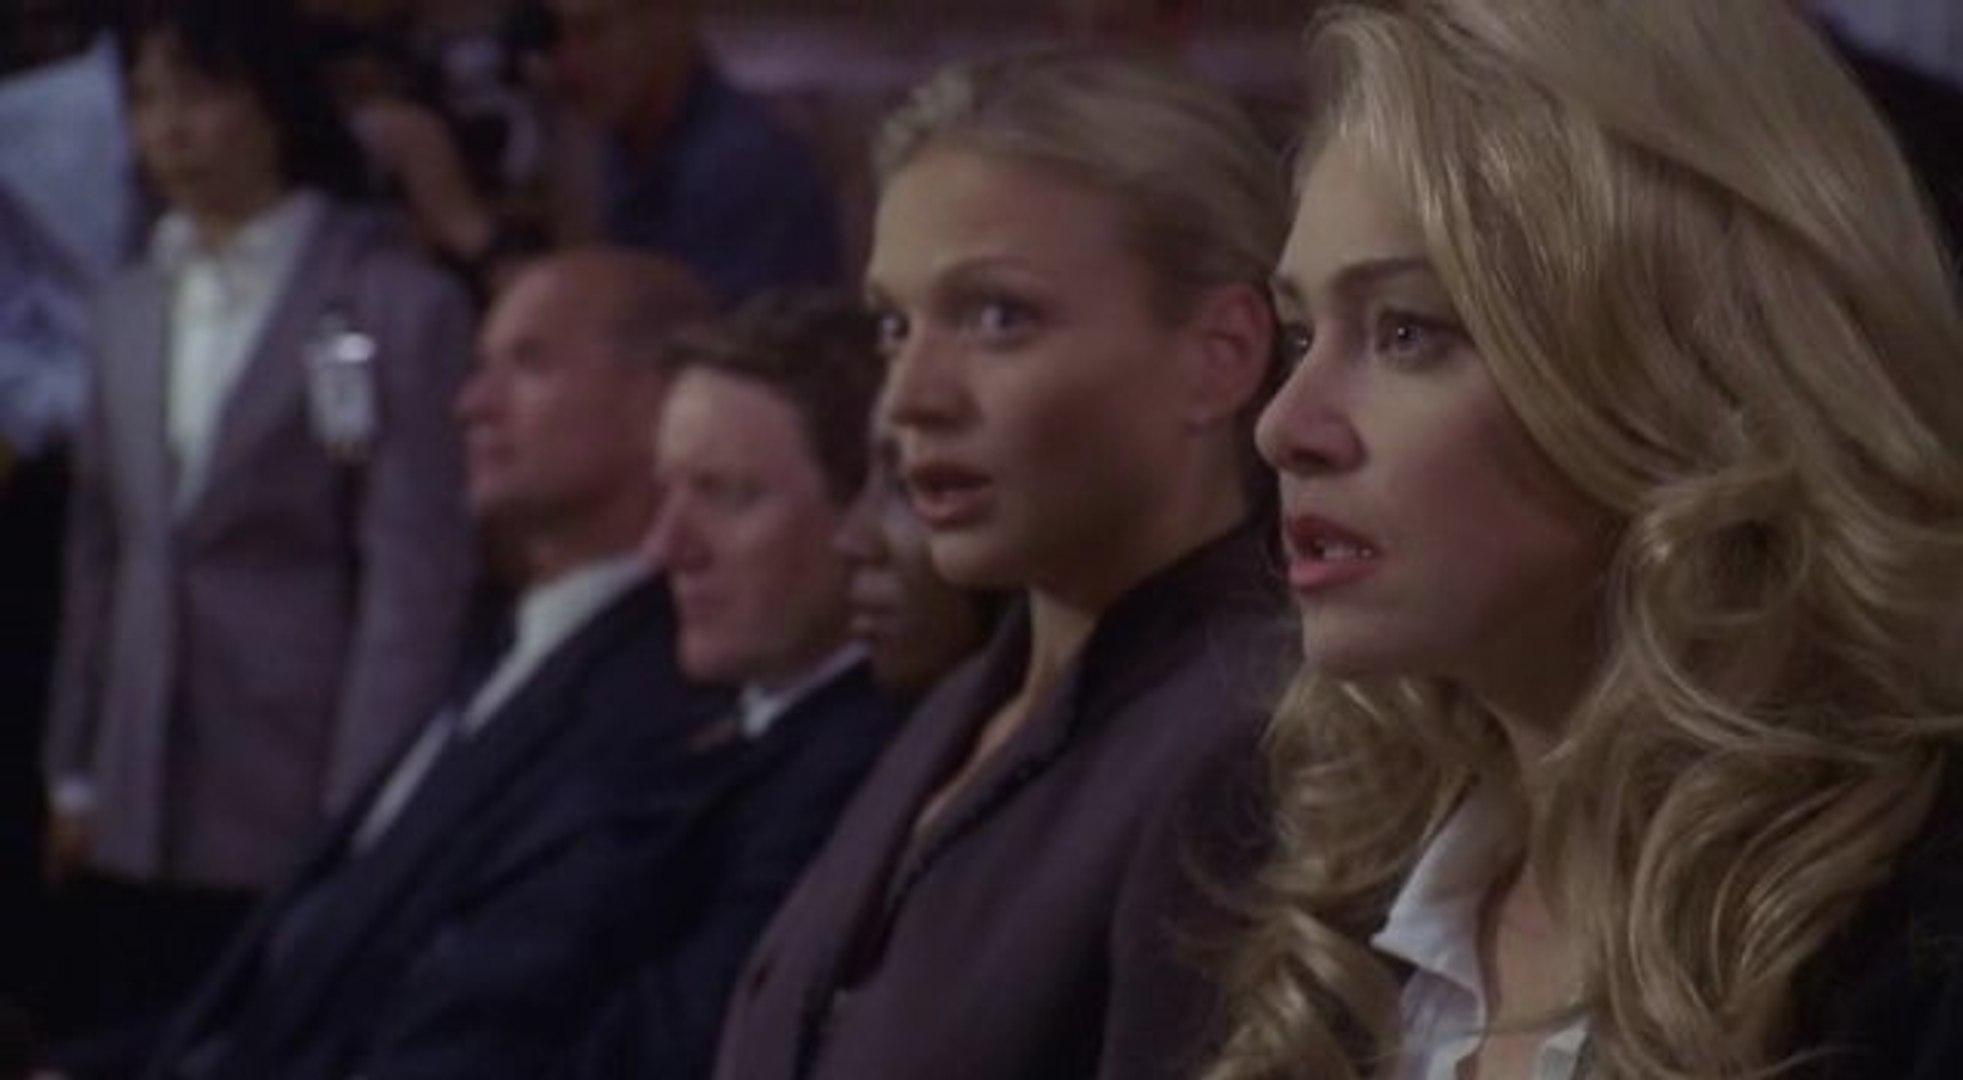 The Twilight Zone (2002) - 08 - Dead Man's Eyes (vietsub)